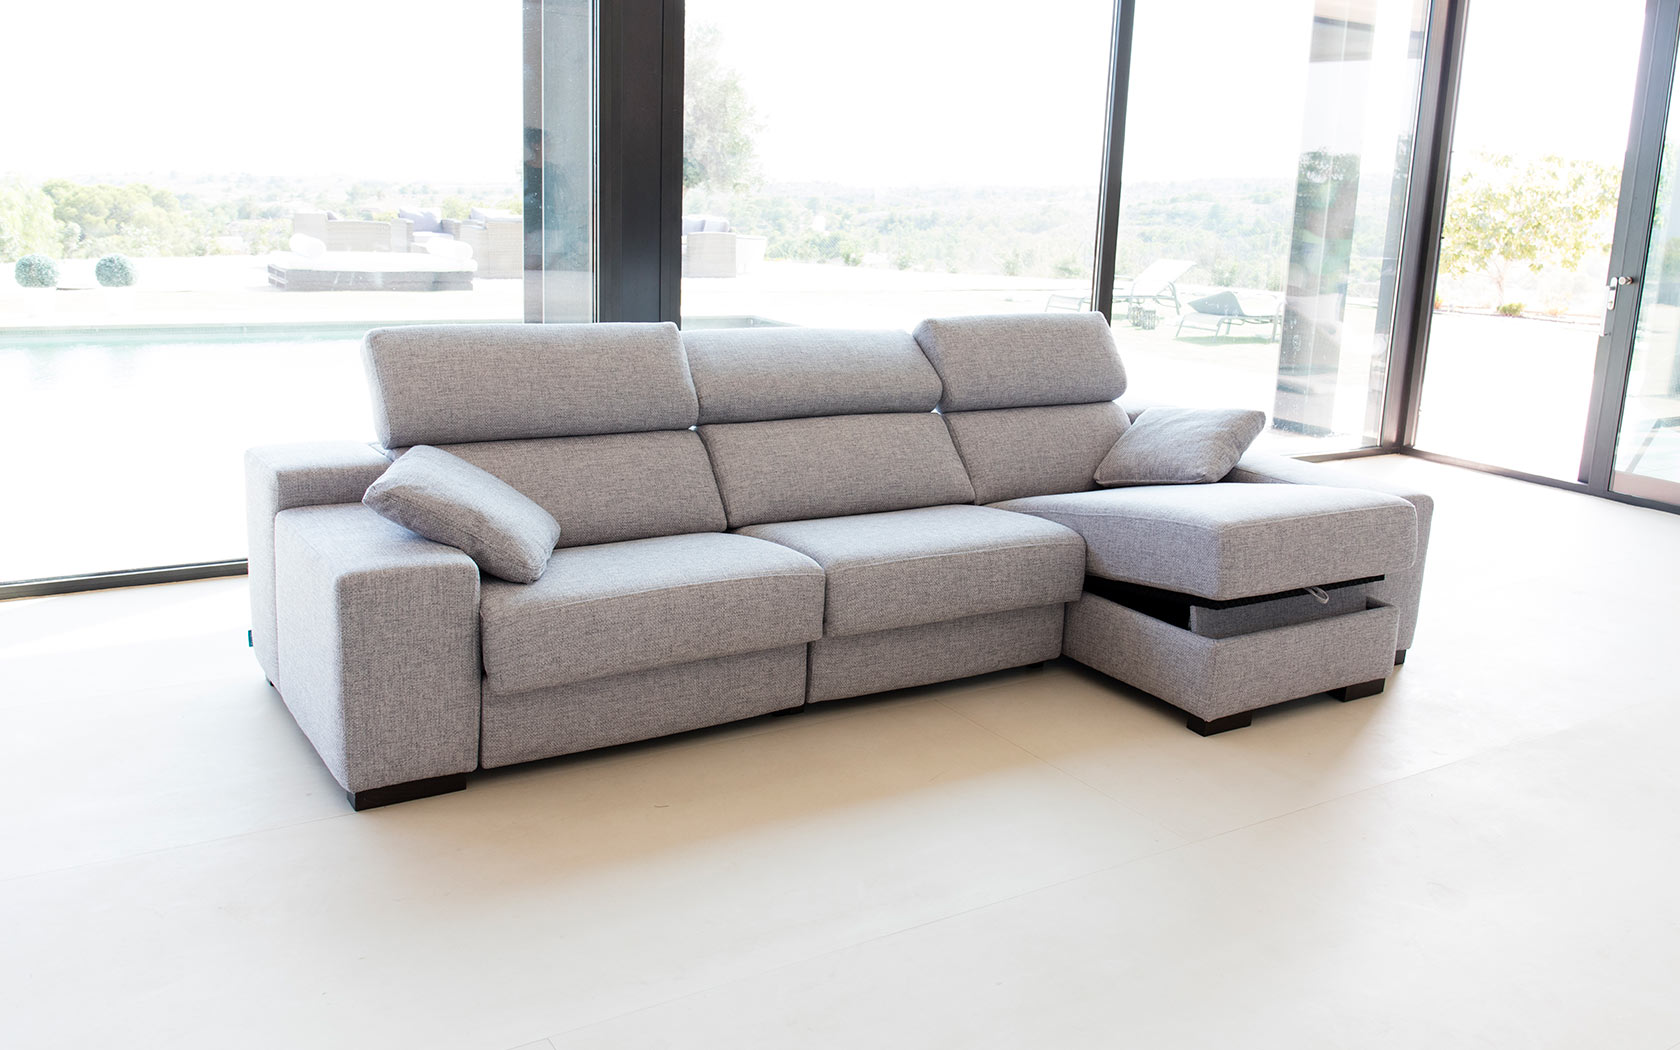 Loto sofá Relax 2019 01